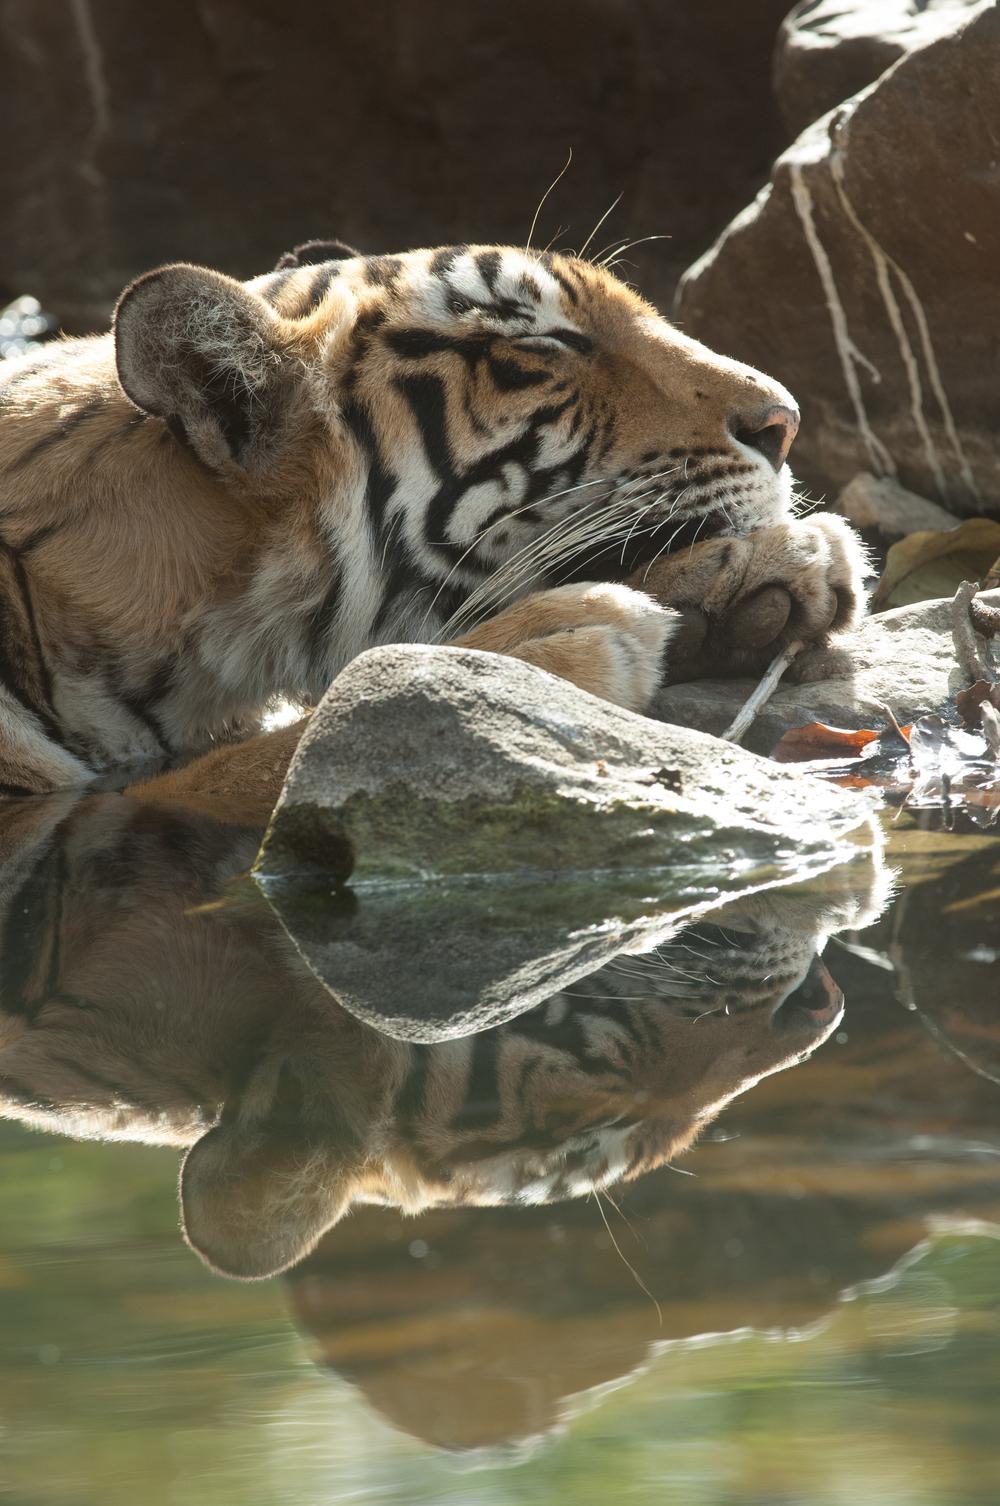 Sundari in the lake of the Rajbagh Area, Ranthambore National Park.  (Photo credit: © Natural History Unit India / Dhritiman Mukherjee)